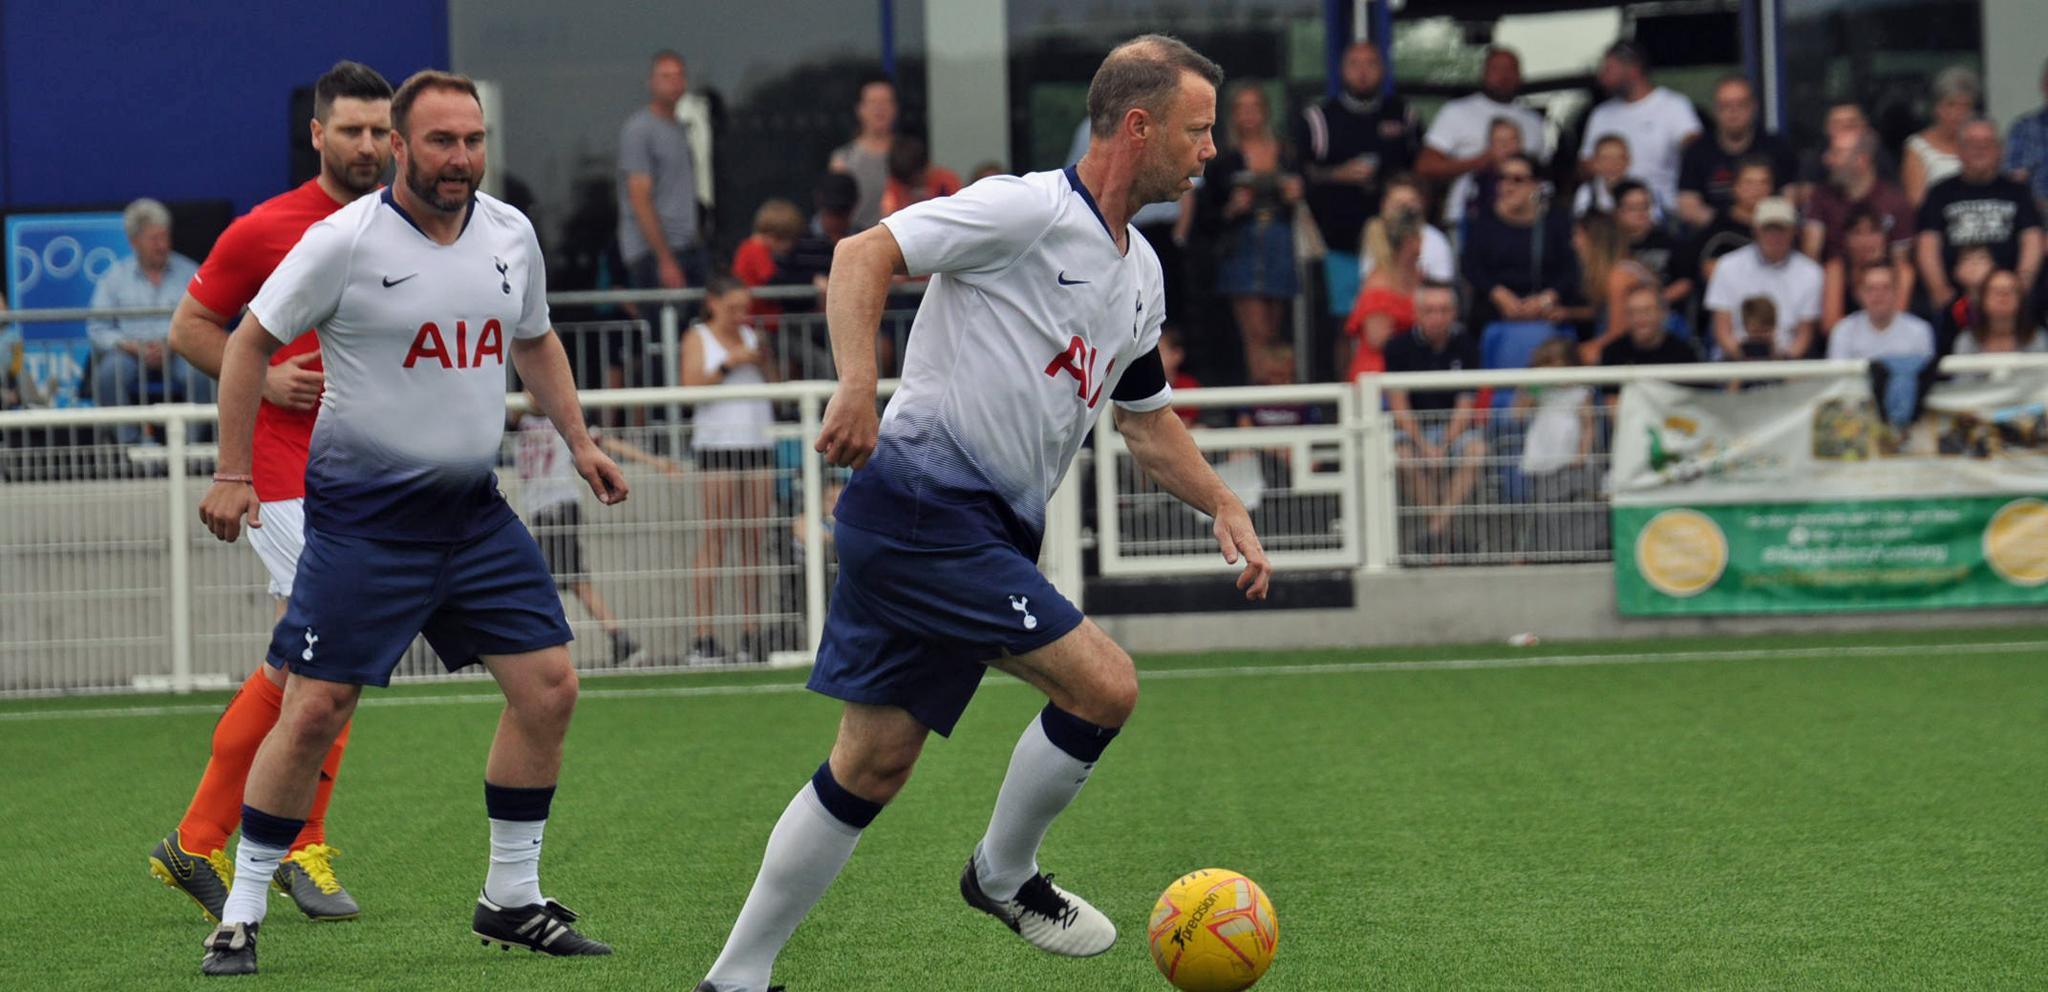 Legends in form heading to Maidstone | Tottenham Hotspur